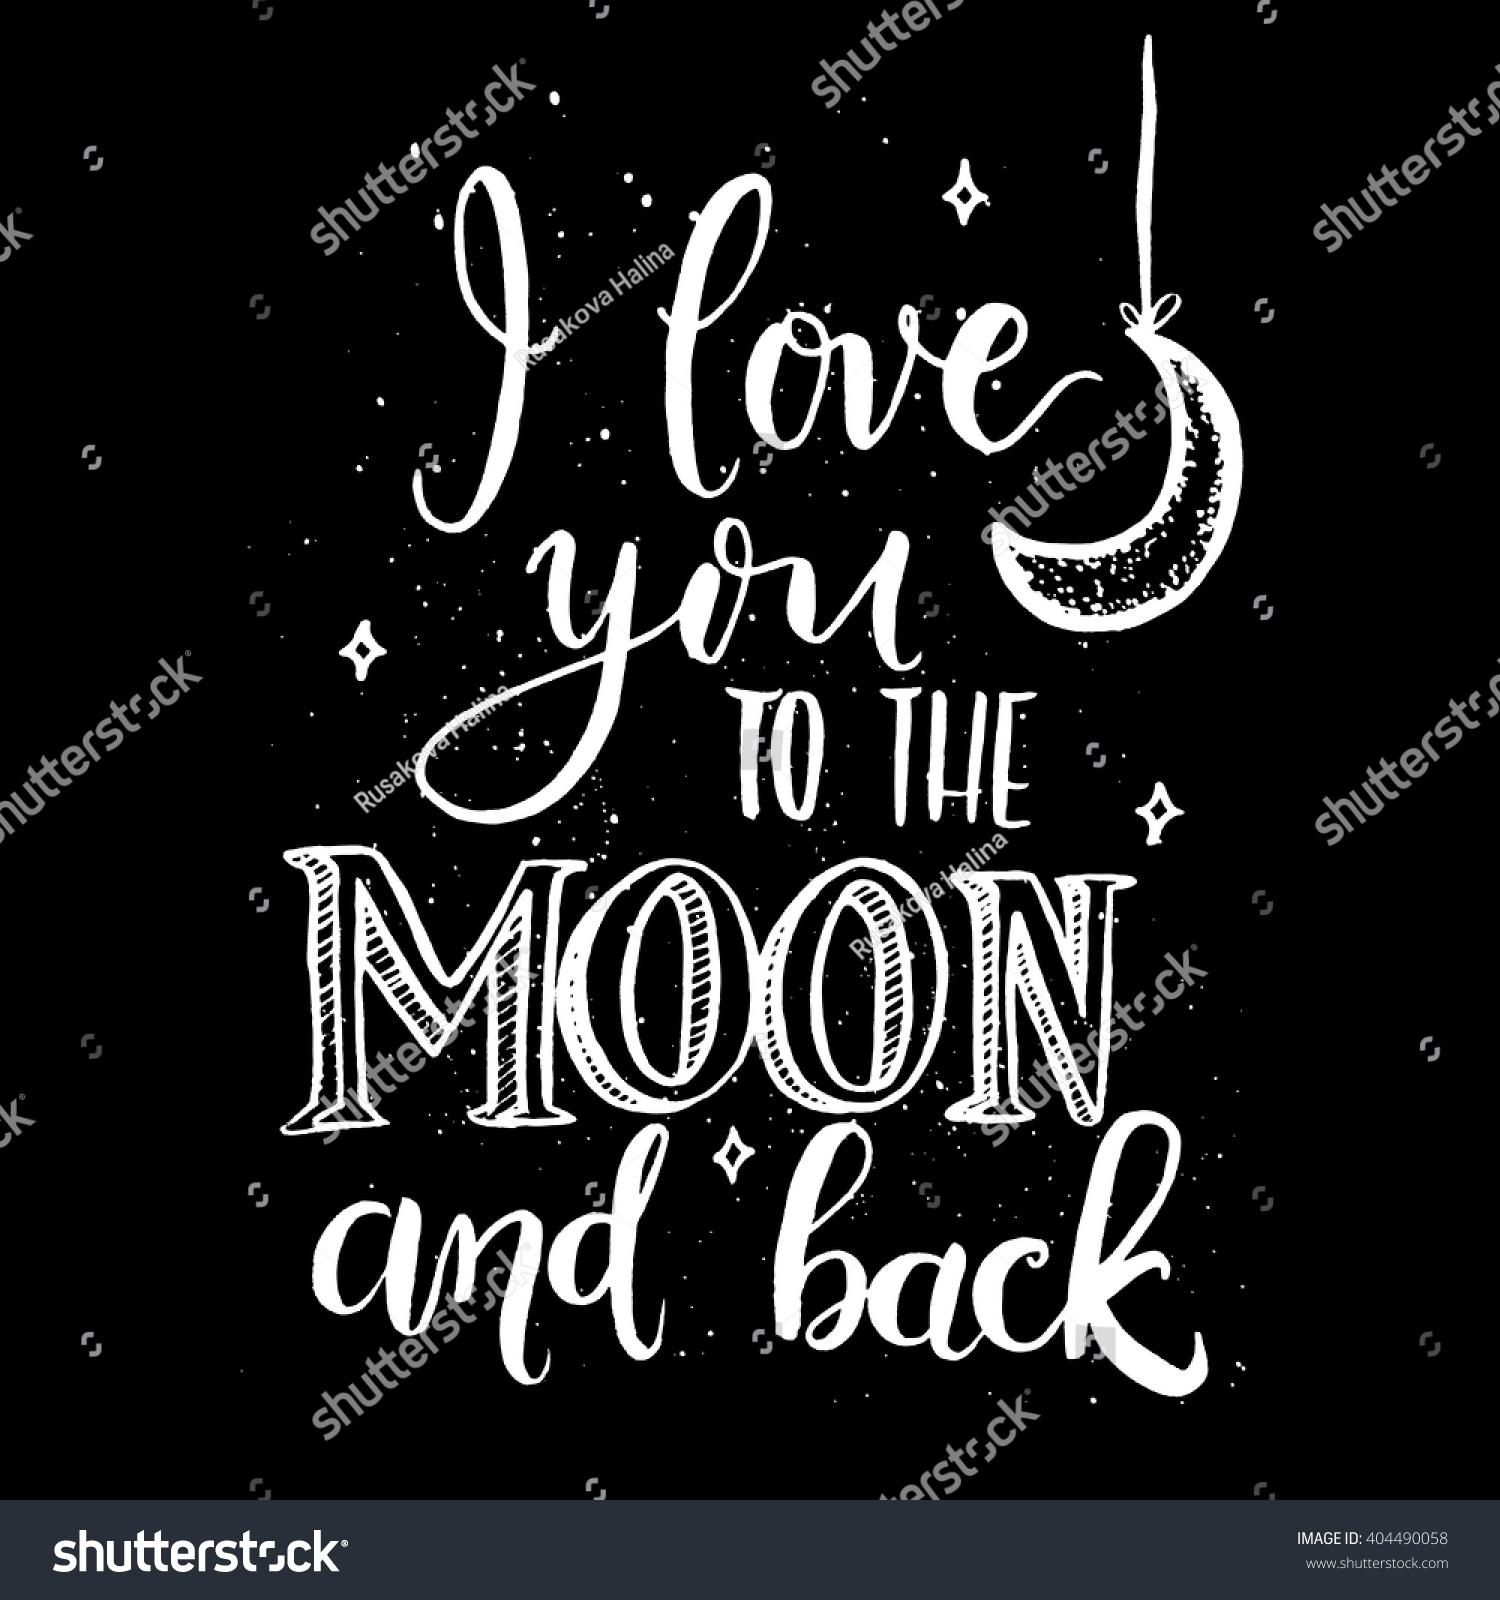 Love you moon backmodern calligraphy vector stock